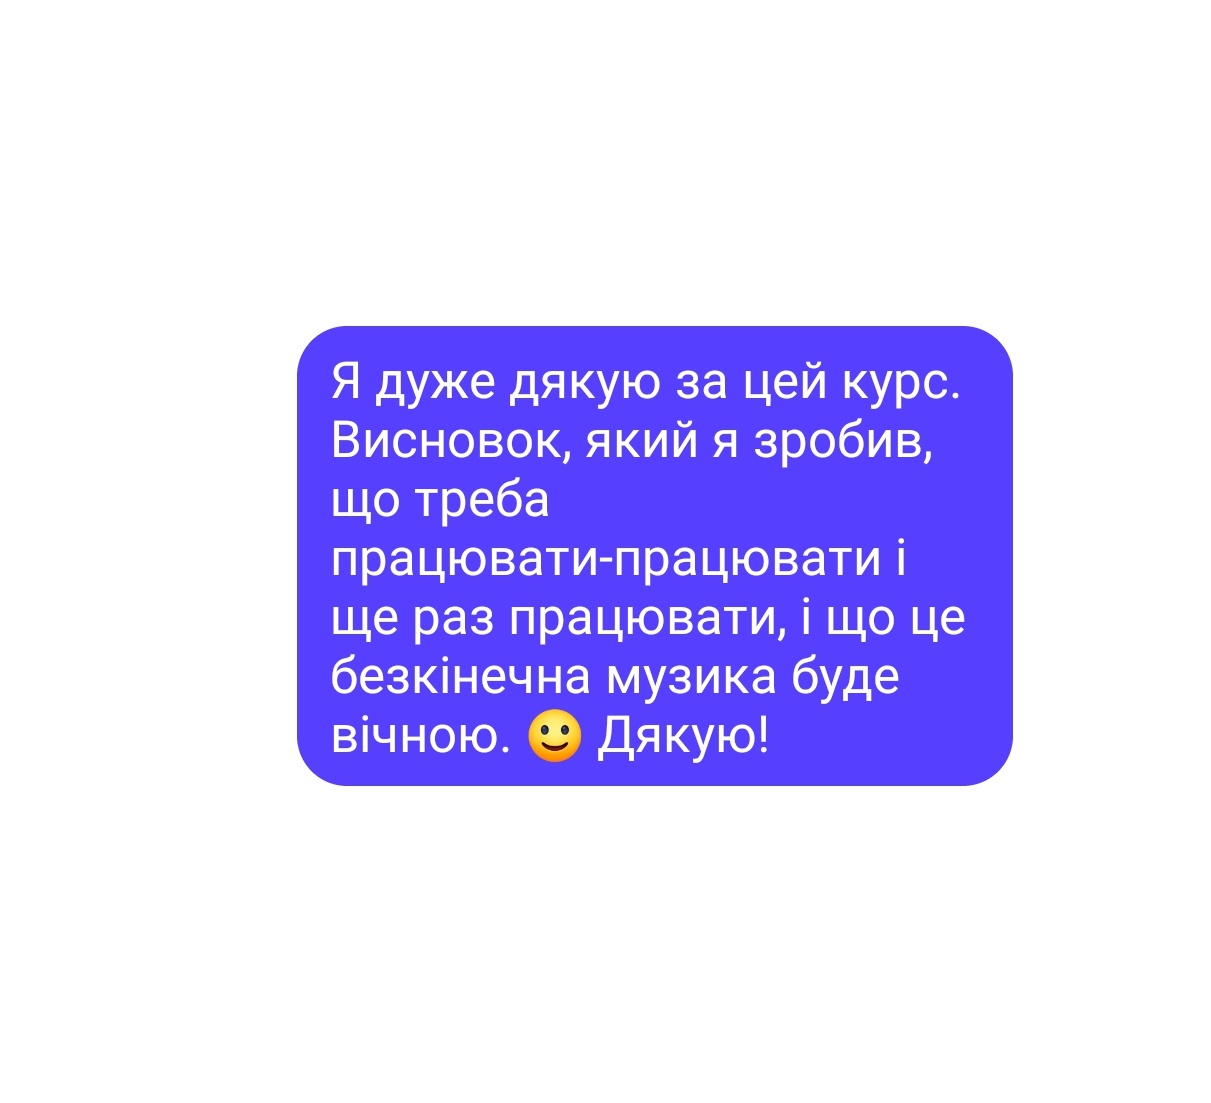 Артем Сохань